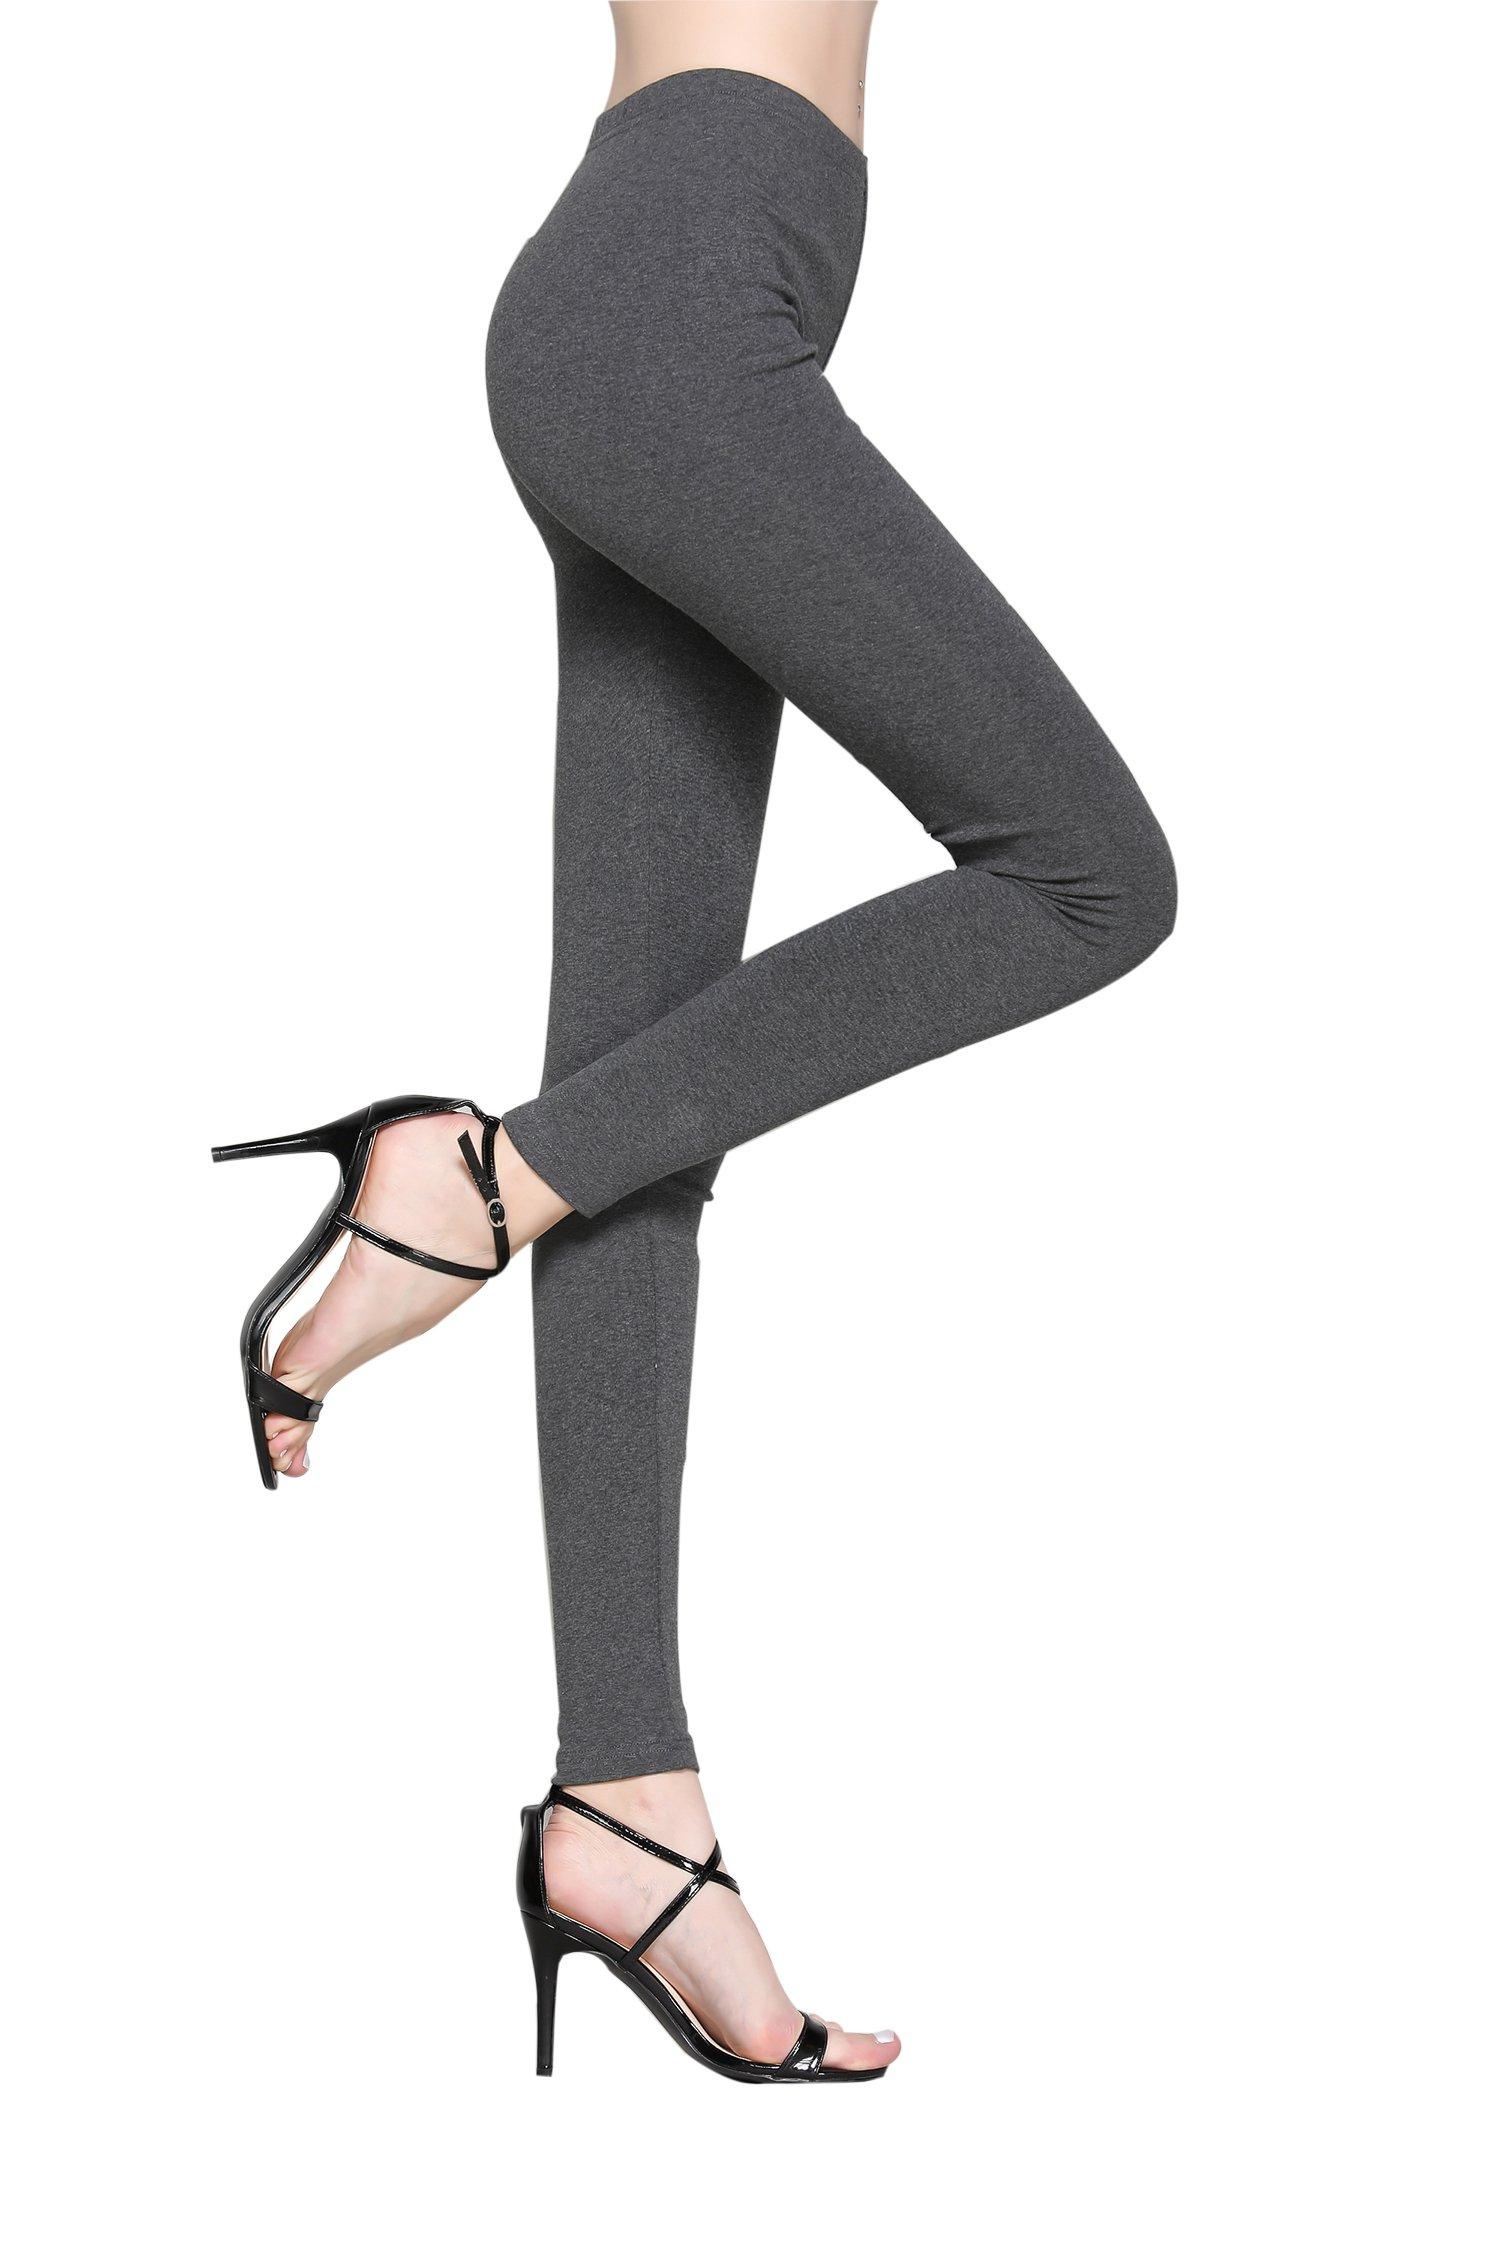 HIKA Women's Basic Cotton Full Length Leggings (X-Large, Heather Grey)